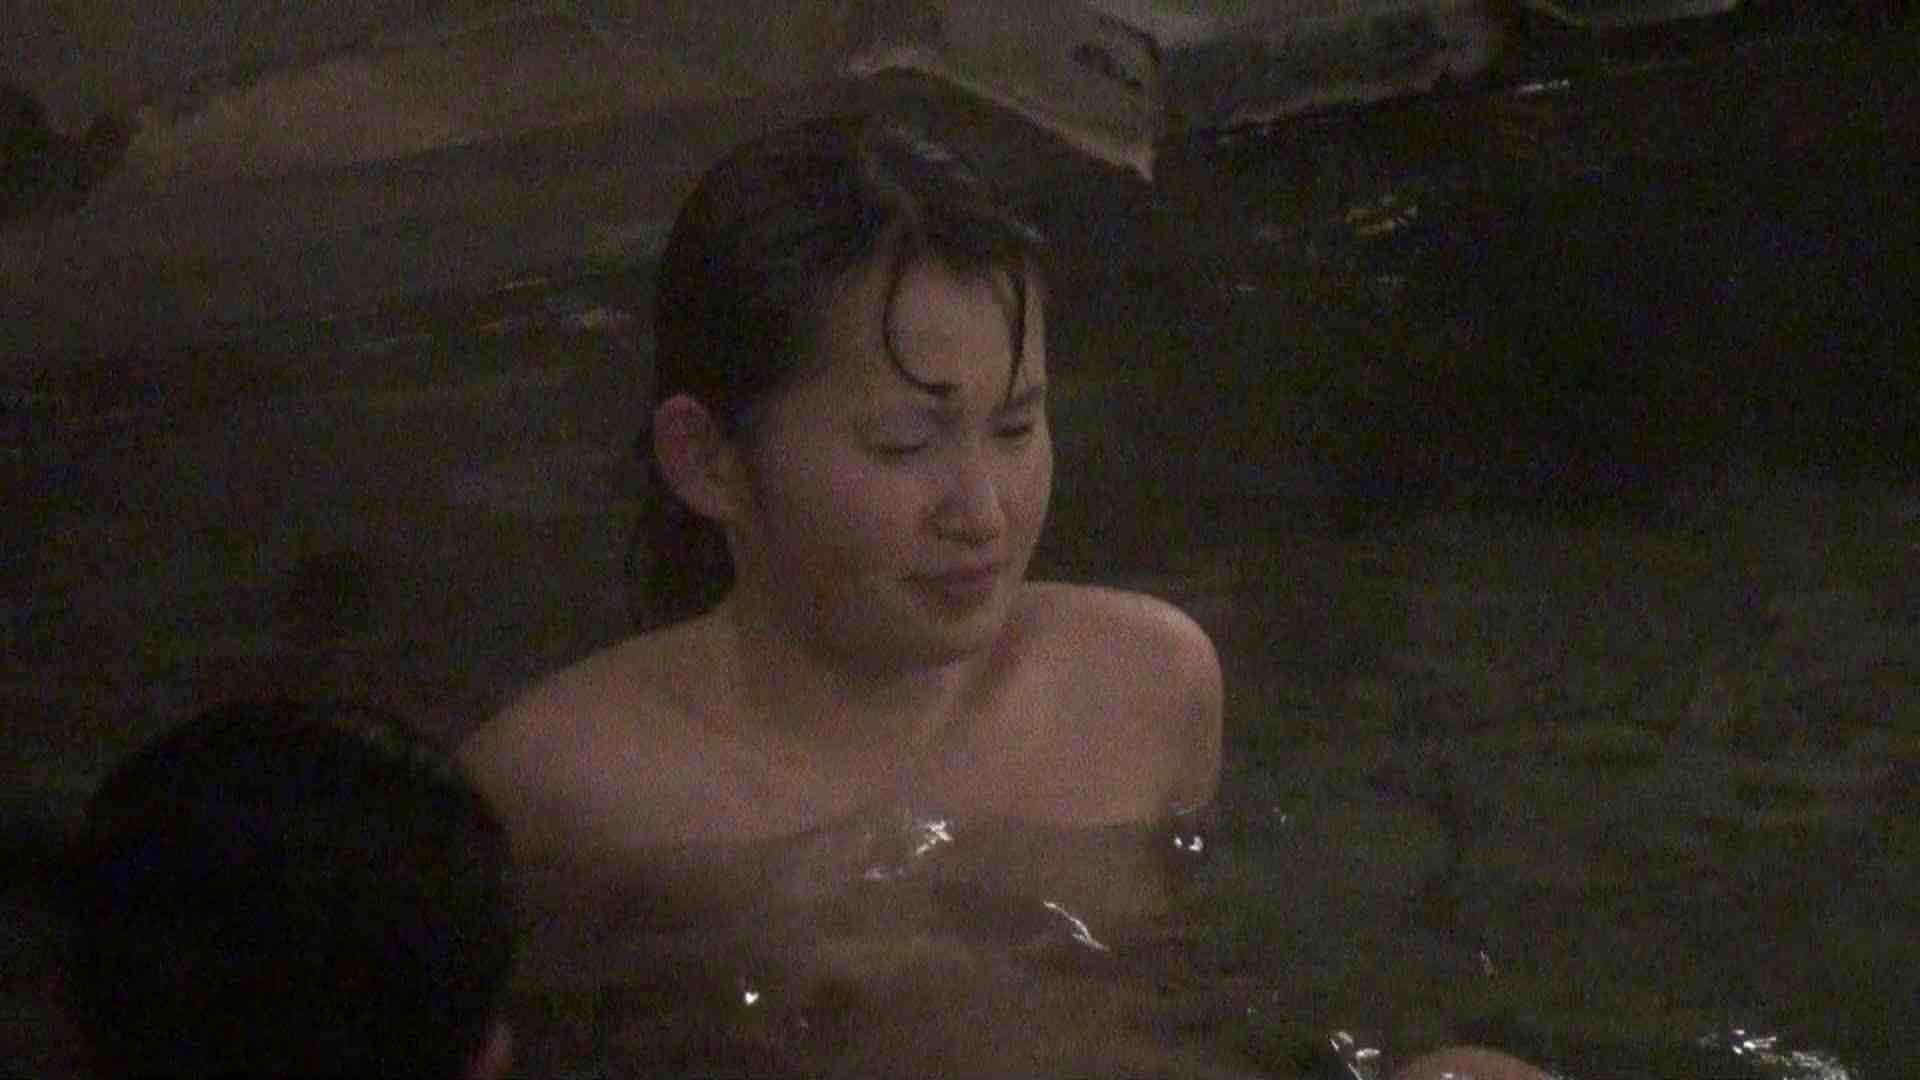 Aquaな露天風呂Vol.349 露天 | OLセックス  103画像 70